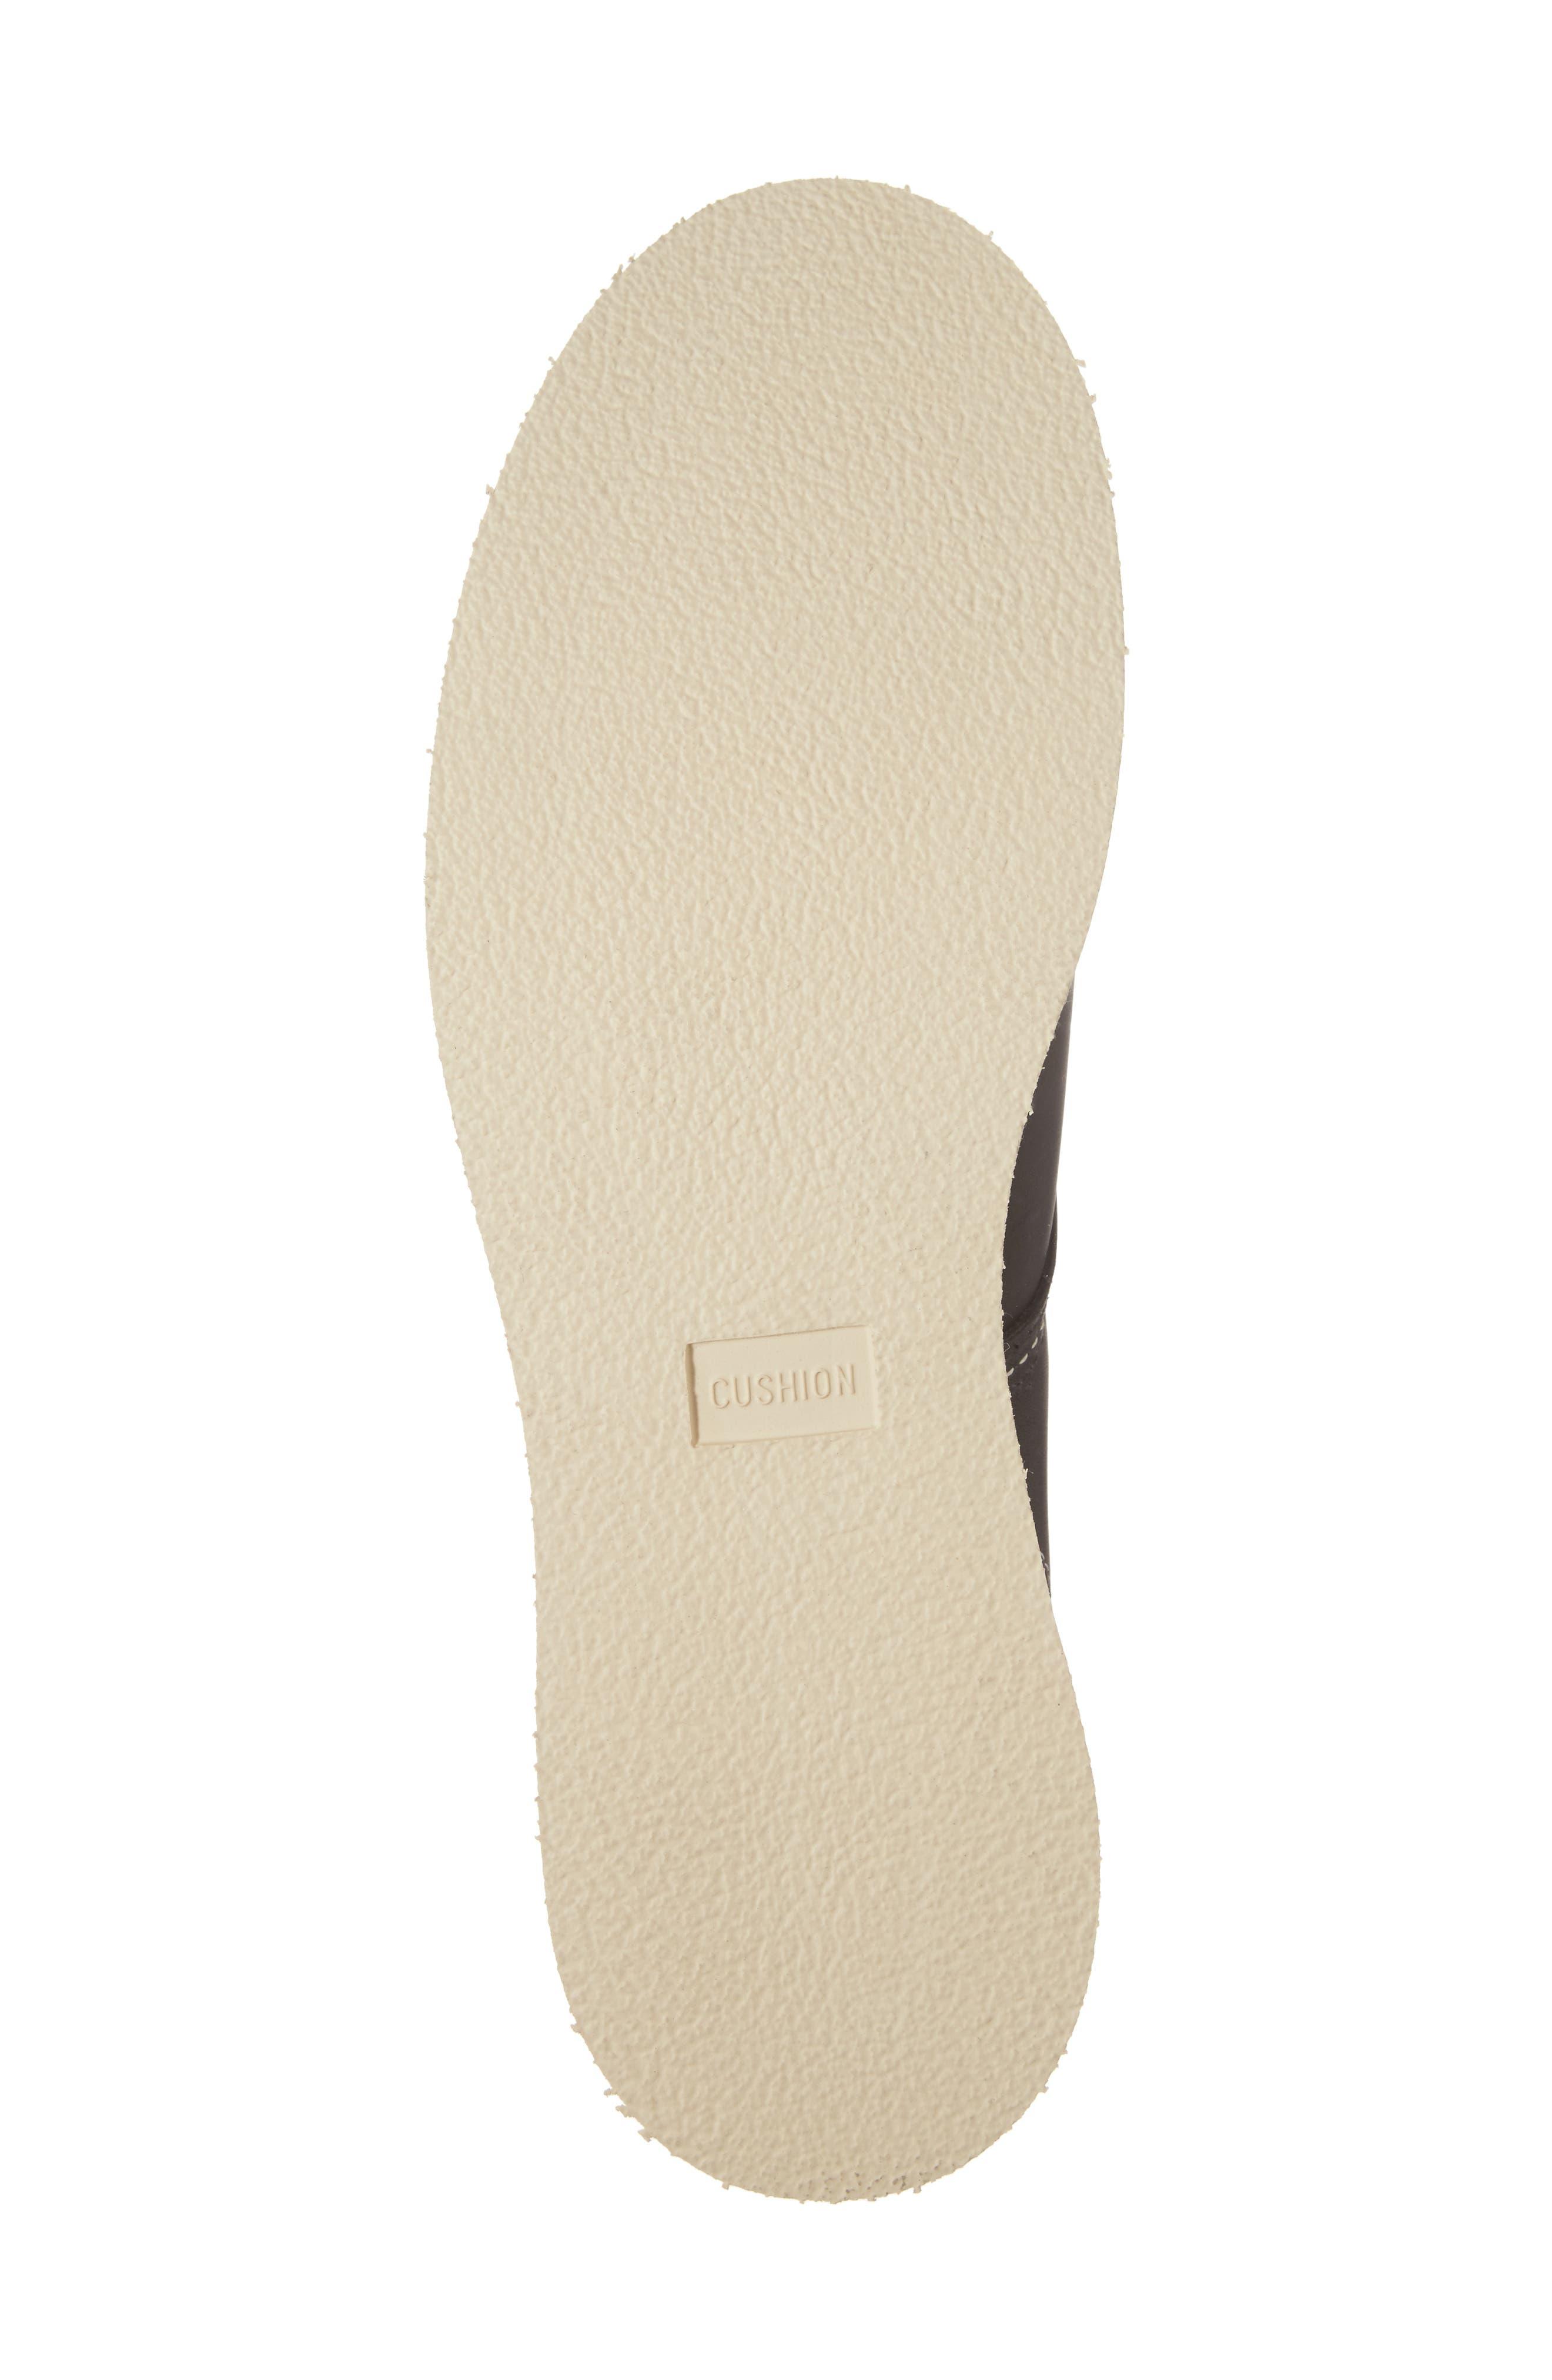 Rover Plain Toe Boot,                             Alternate thumbnail 6, color,                             Black Harness Leather